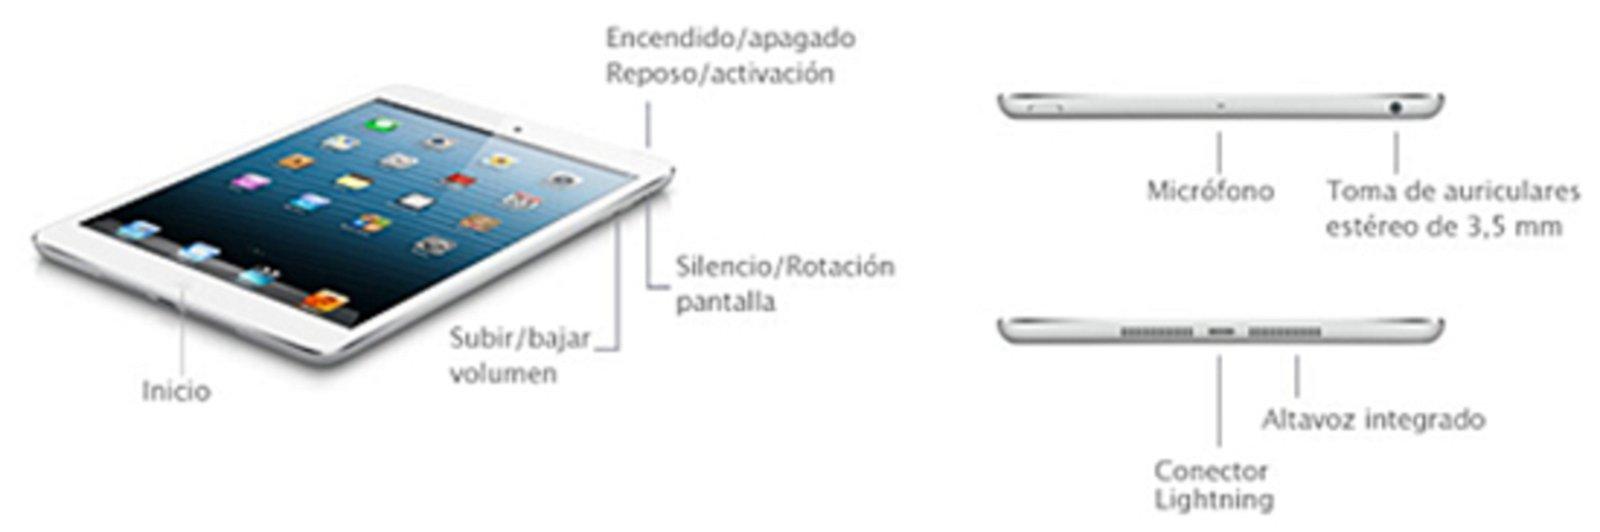 identificar-modelo-ipad-8